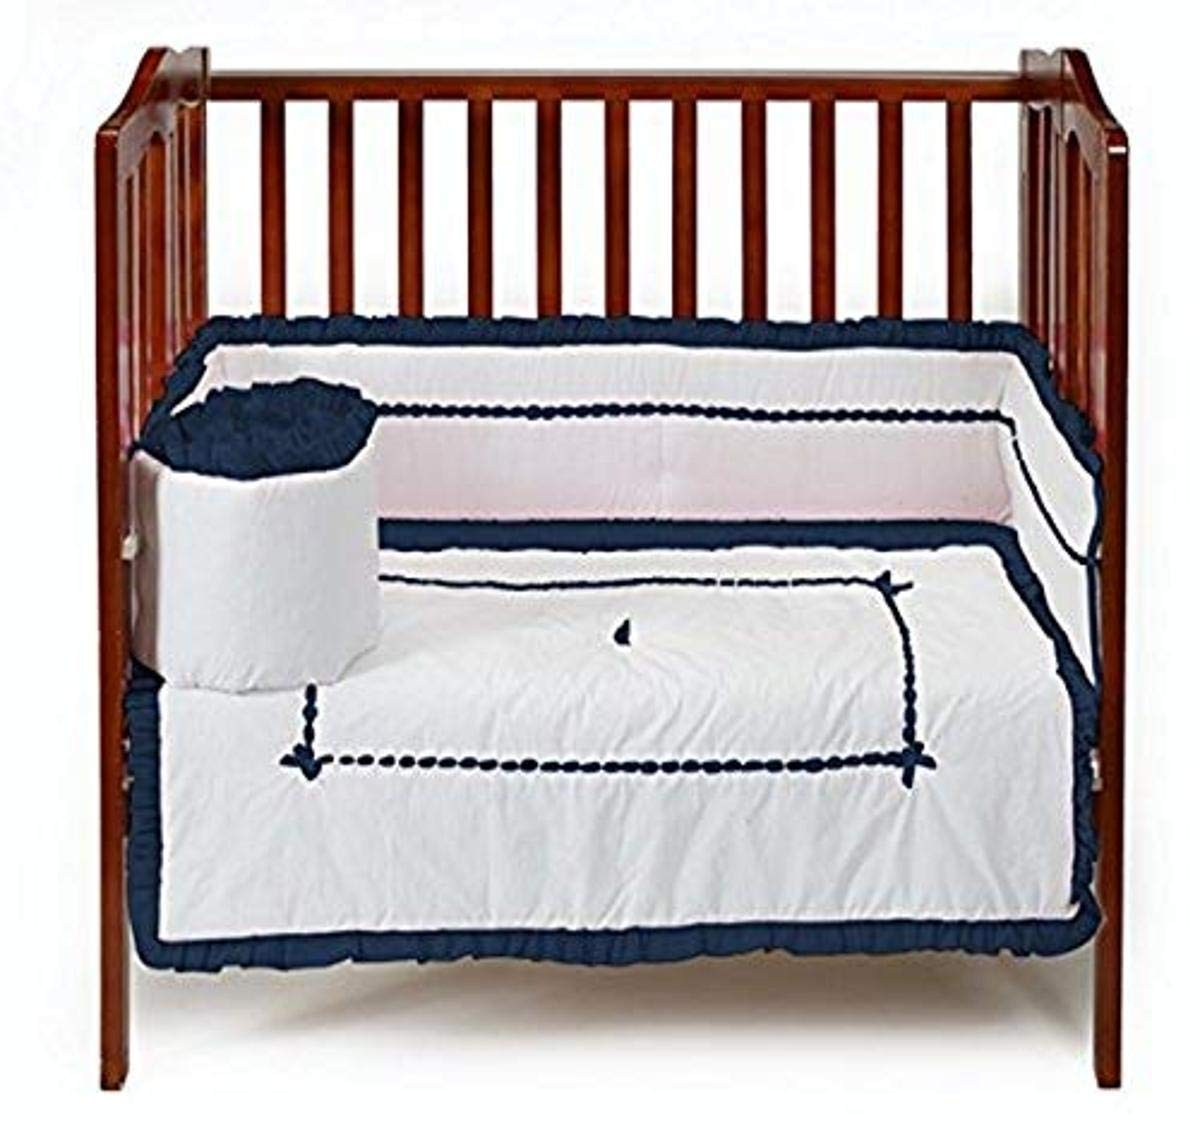 Baby Doll Bedding Unique Mini Cirb/Port-a-Crib Bedding Set, Navy